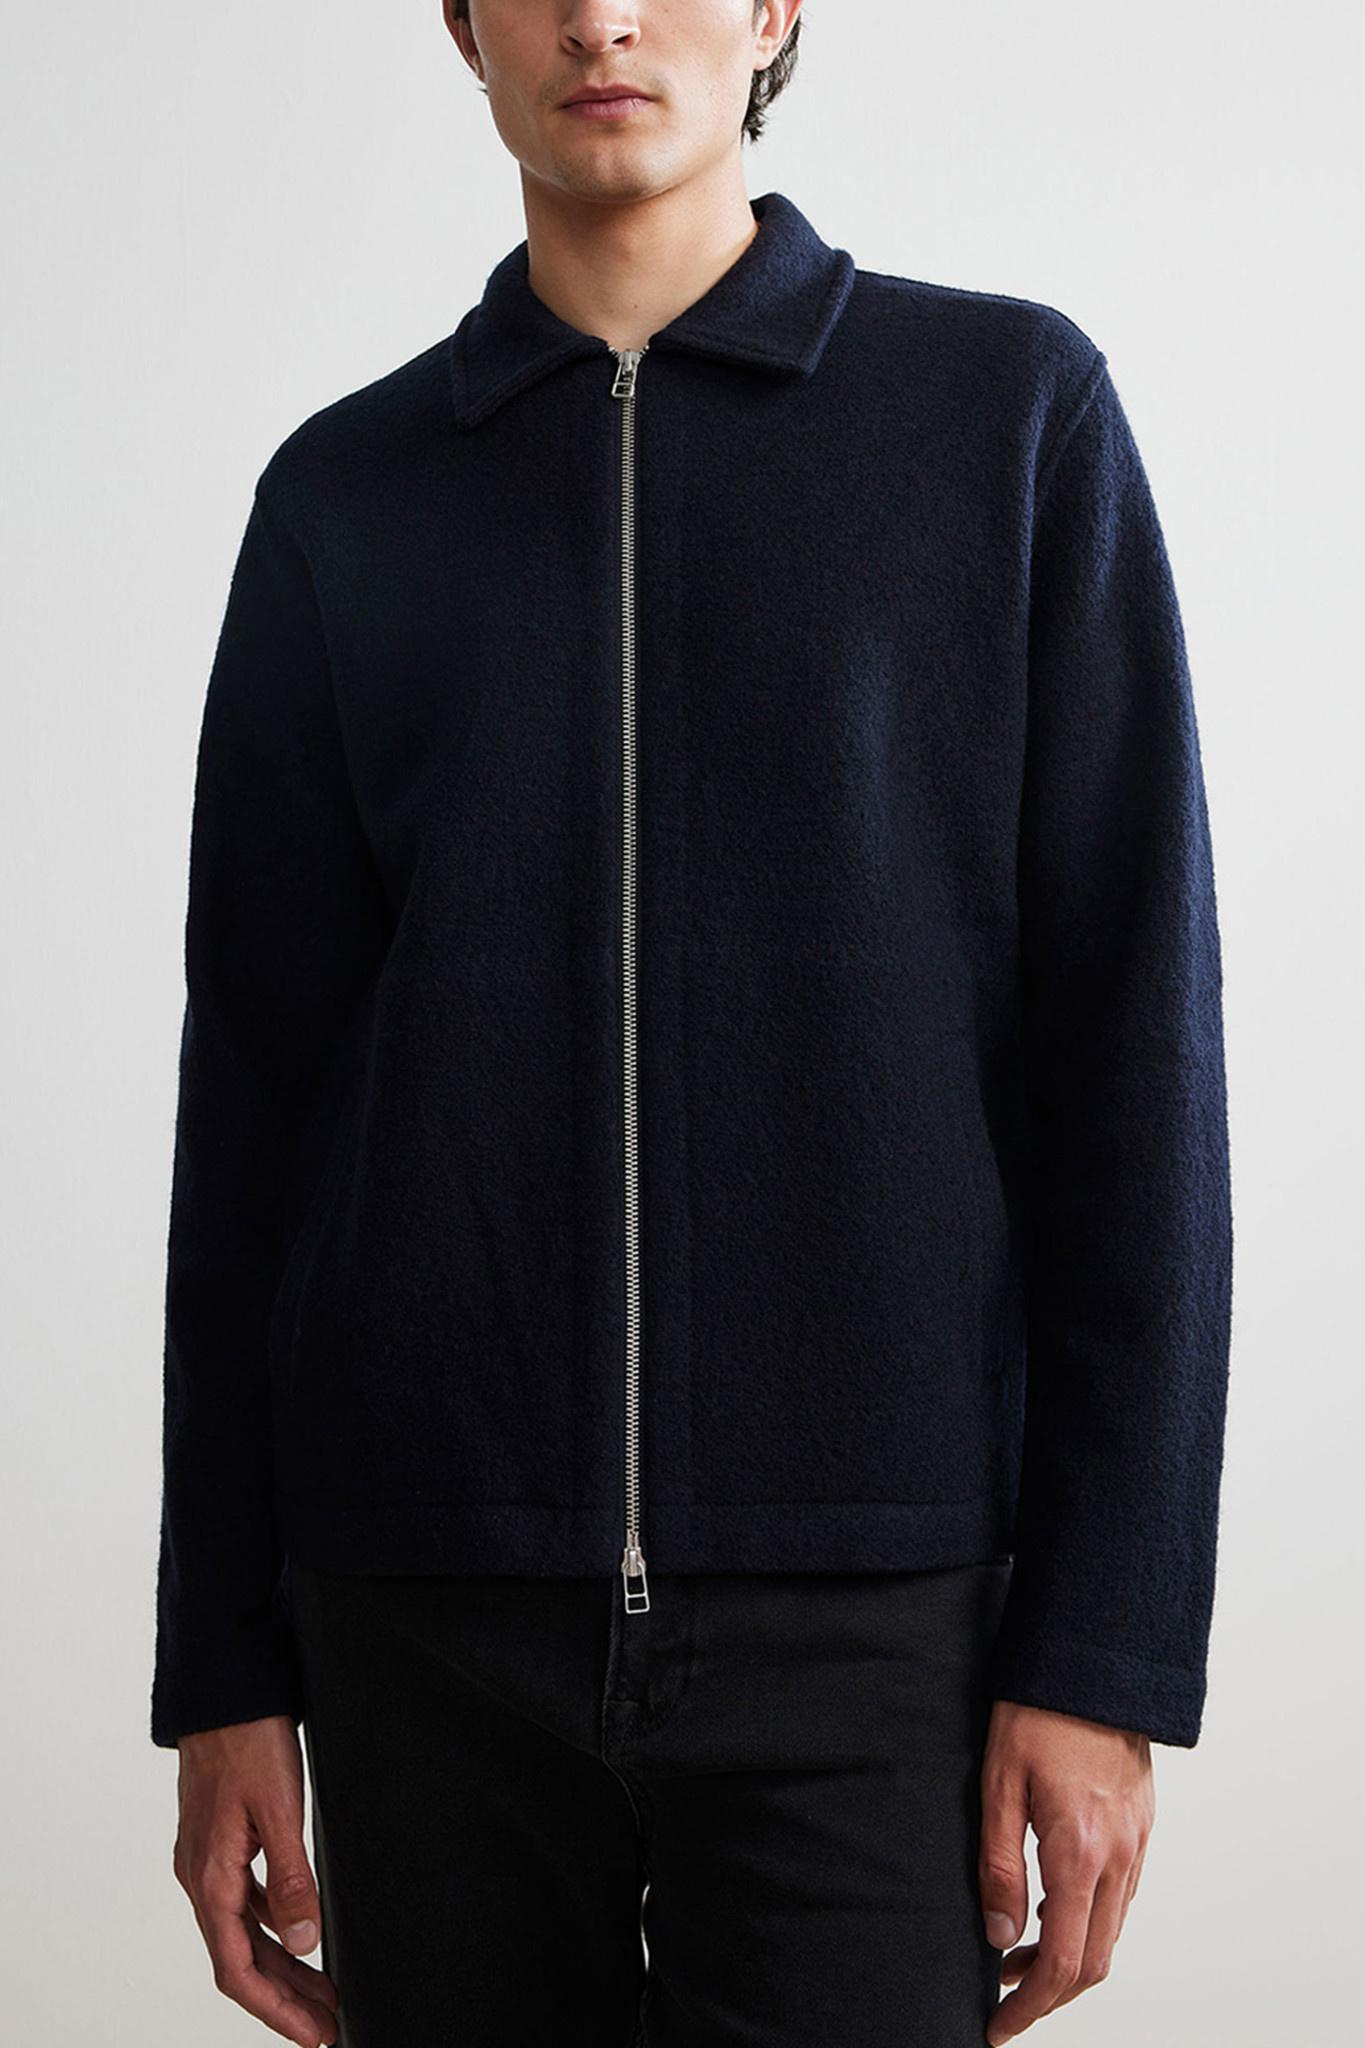 Ivan Overshirt Wool - Dark Blue-1